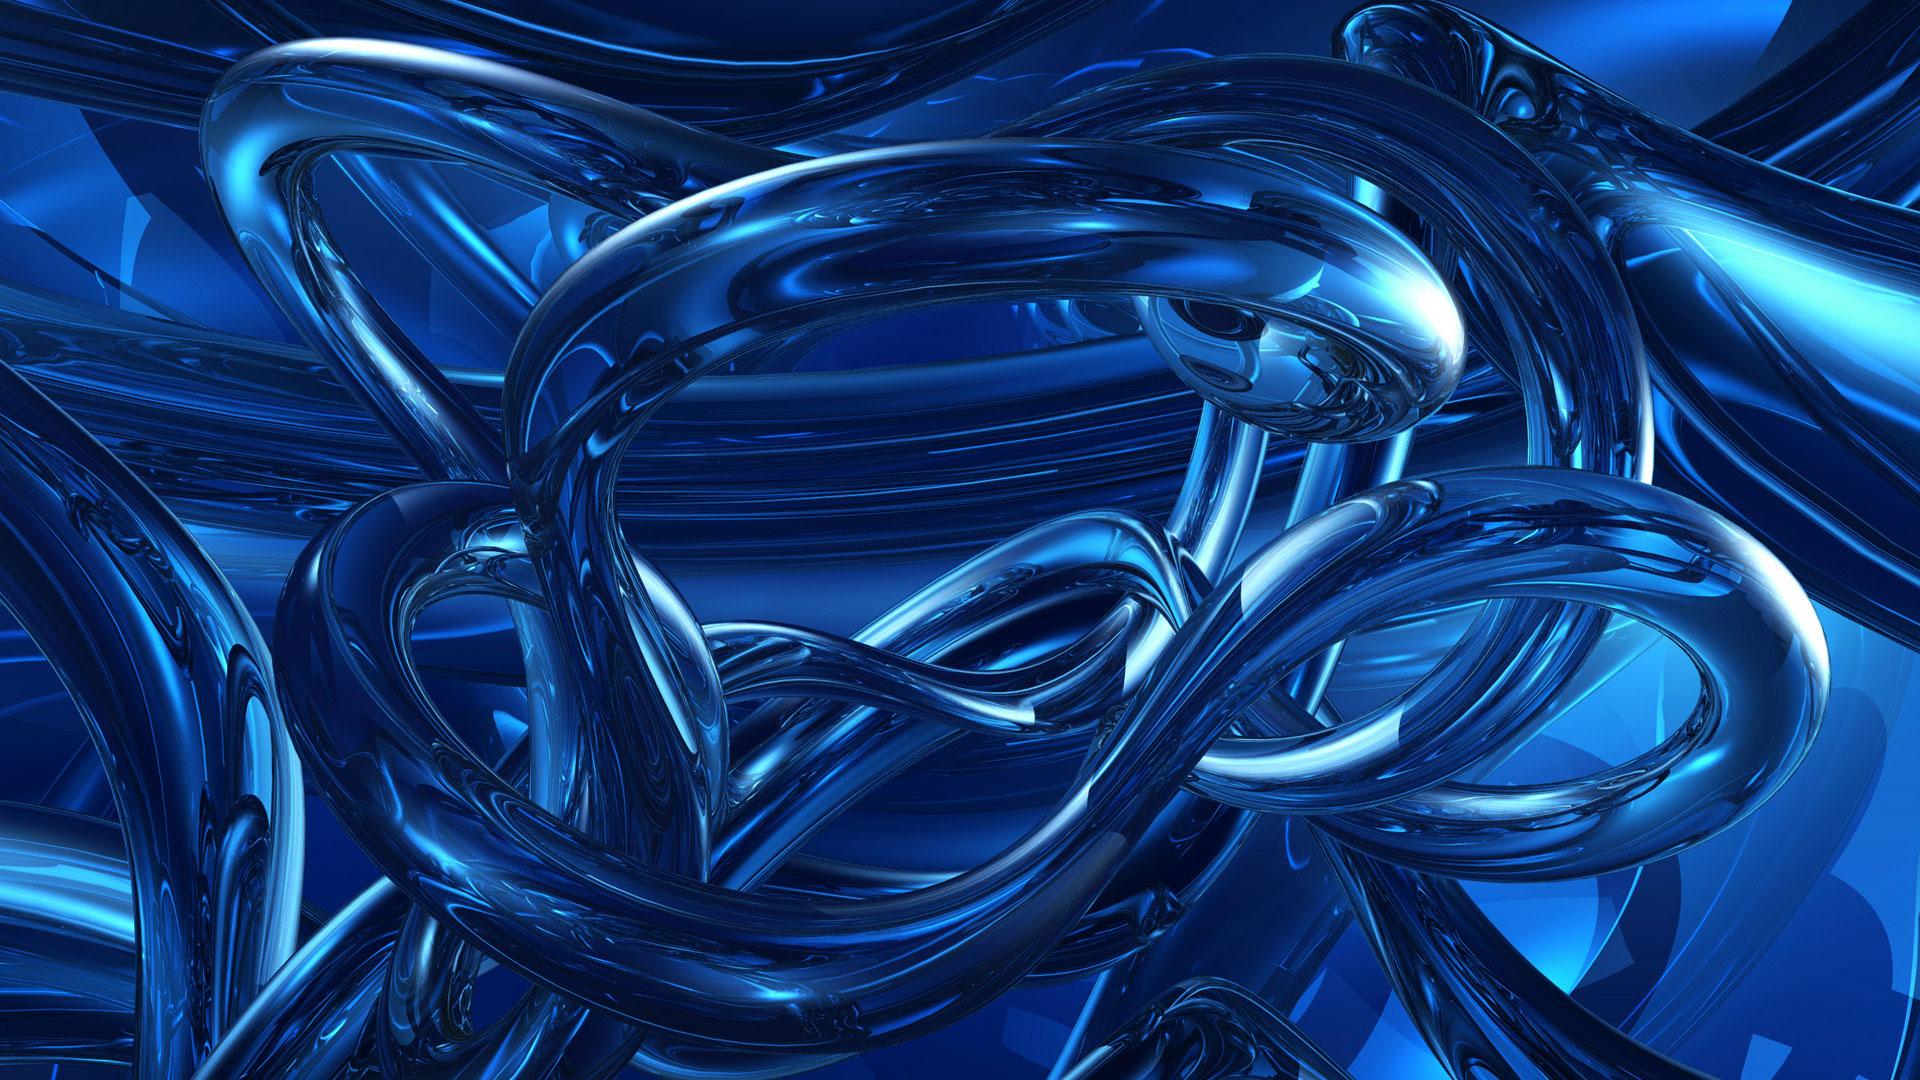 3D Wallpapers Abstract Desktop Backgrounds HD Wallpapers Art 1920x1080